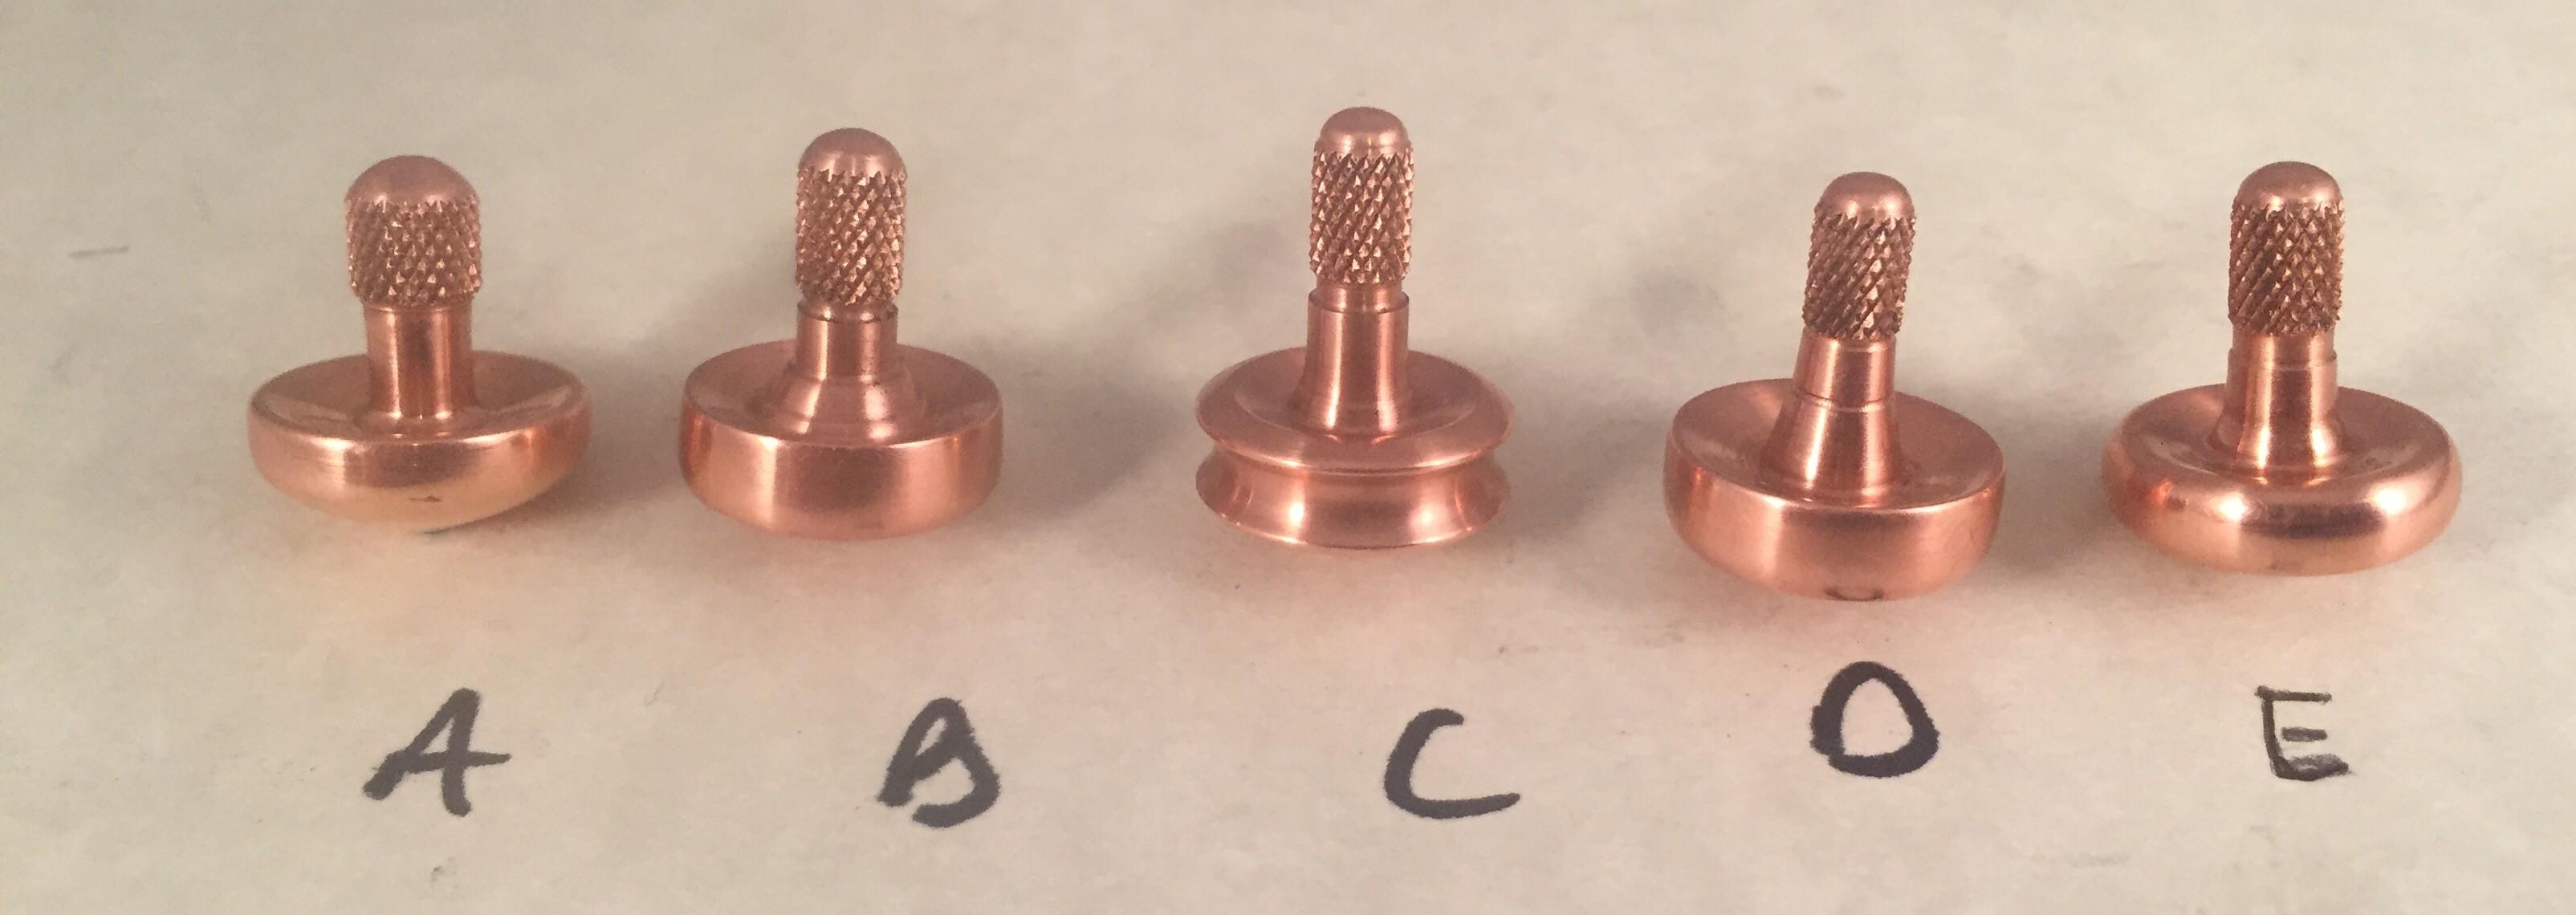 Upsidedownworks signupsale Copper countertops cost